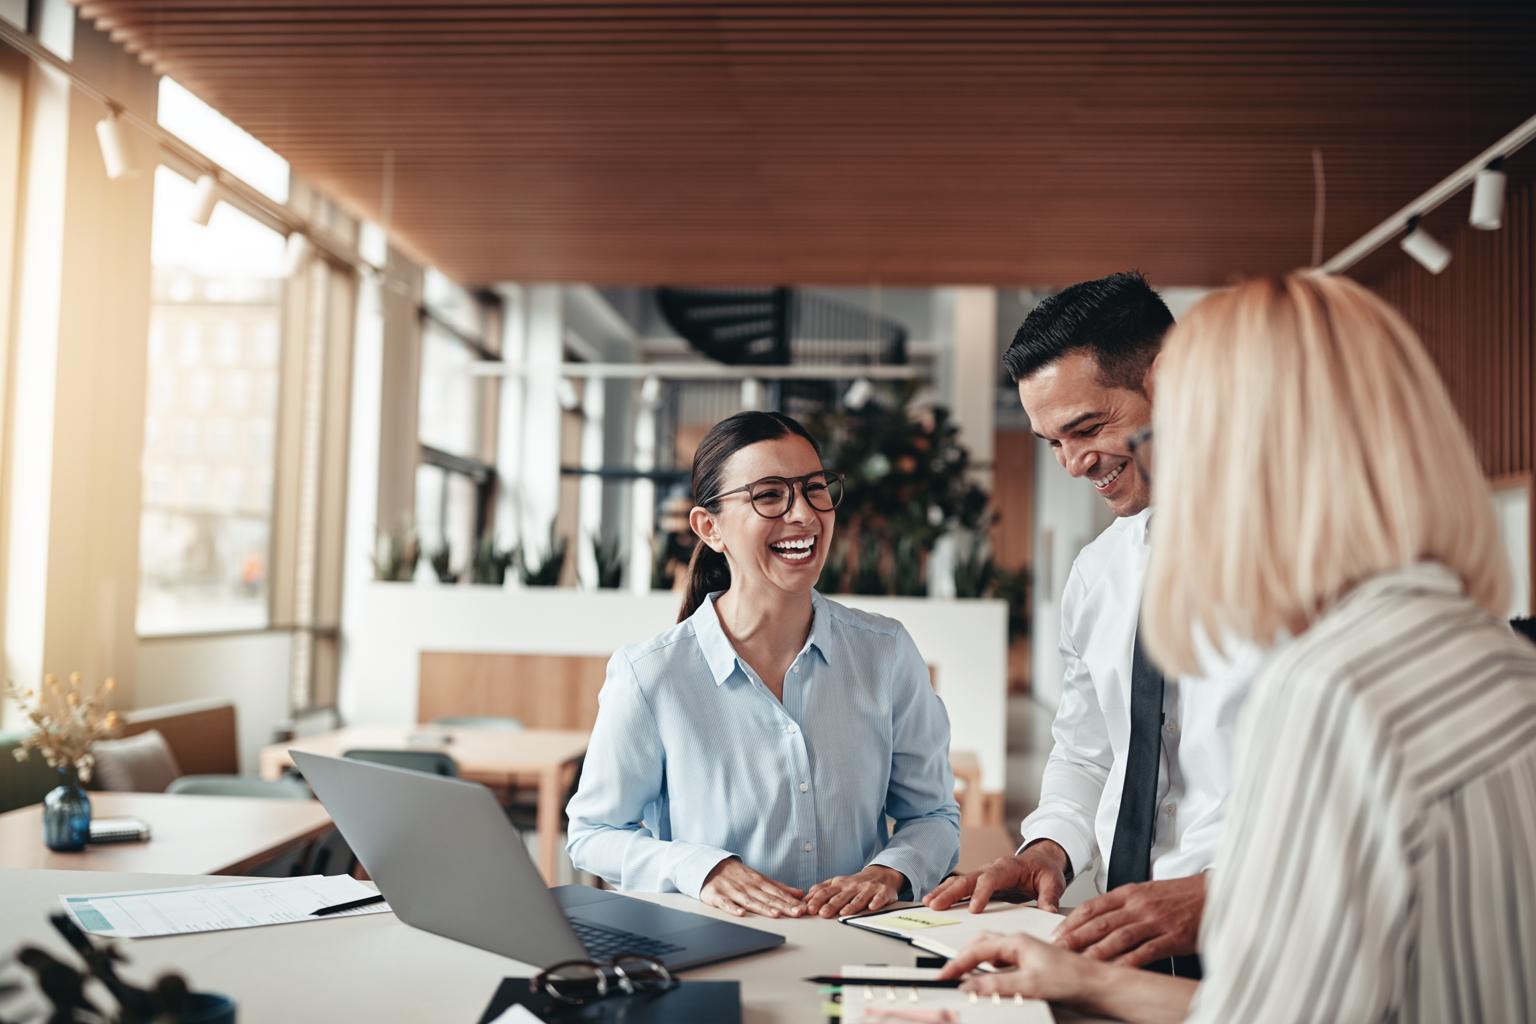 people smiling at desk